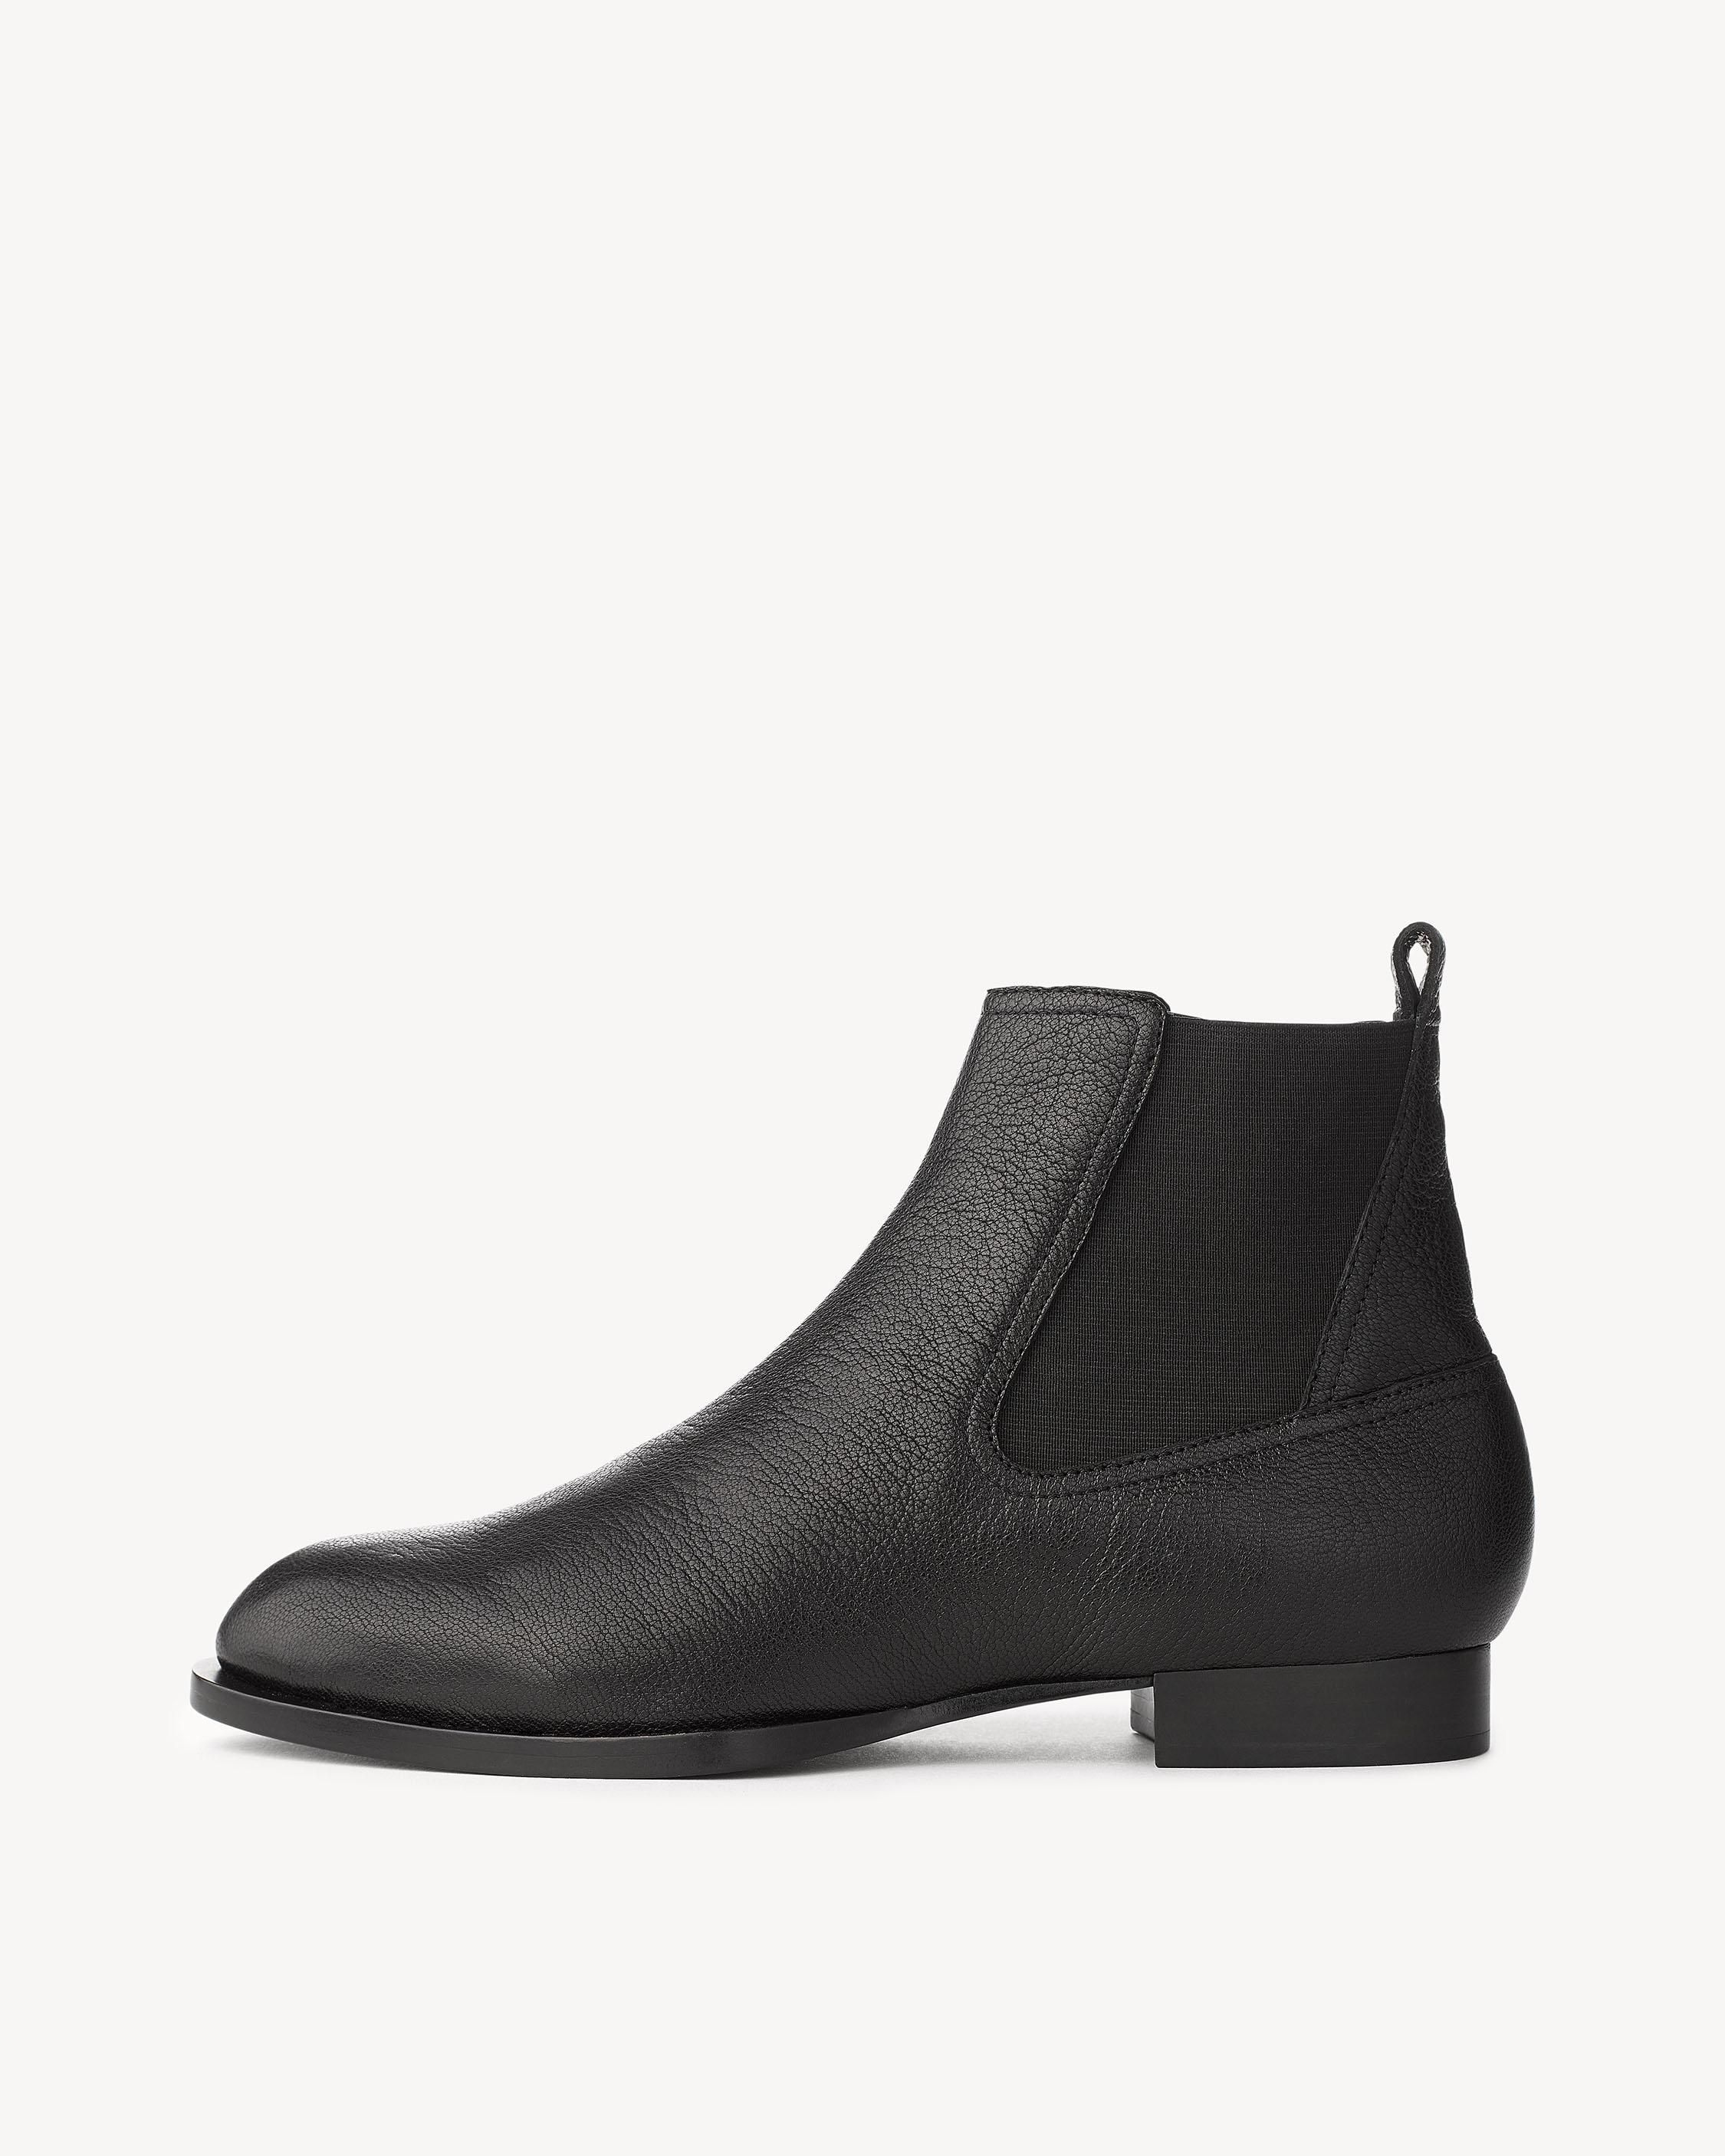 Rag bone boots, Black flat boots